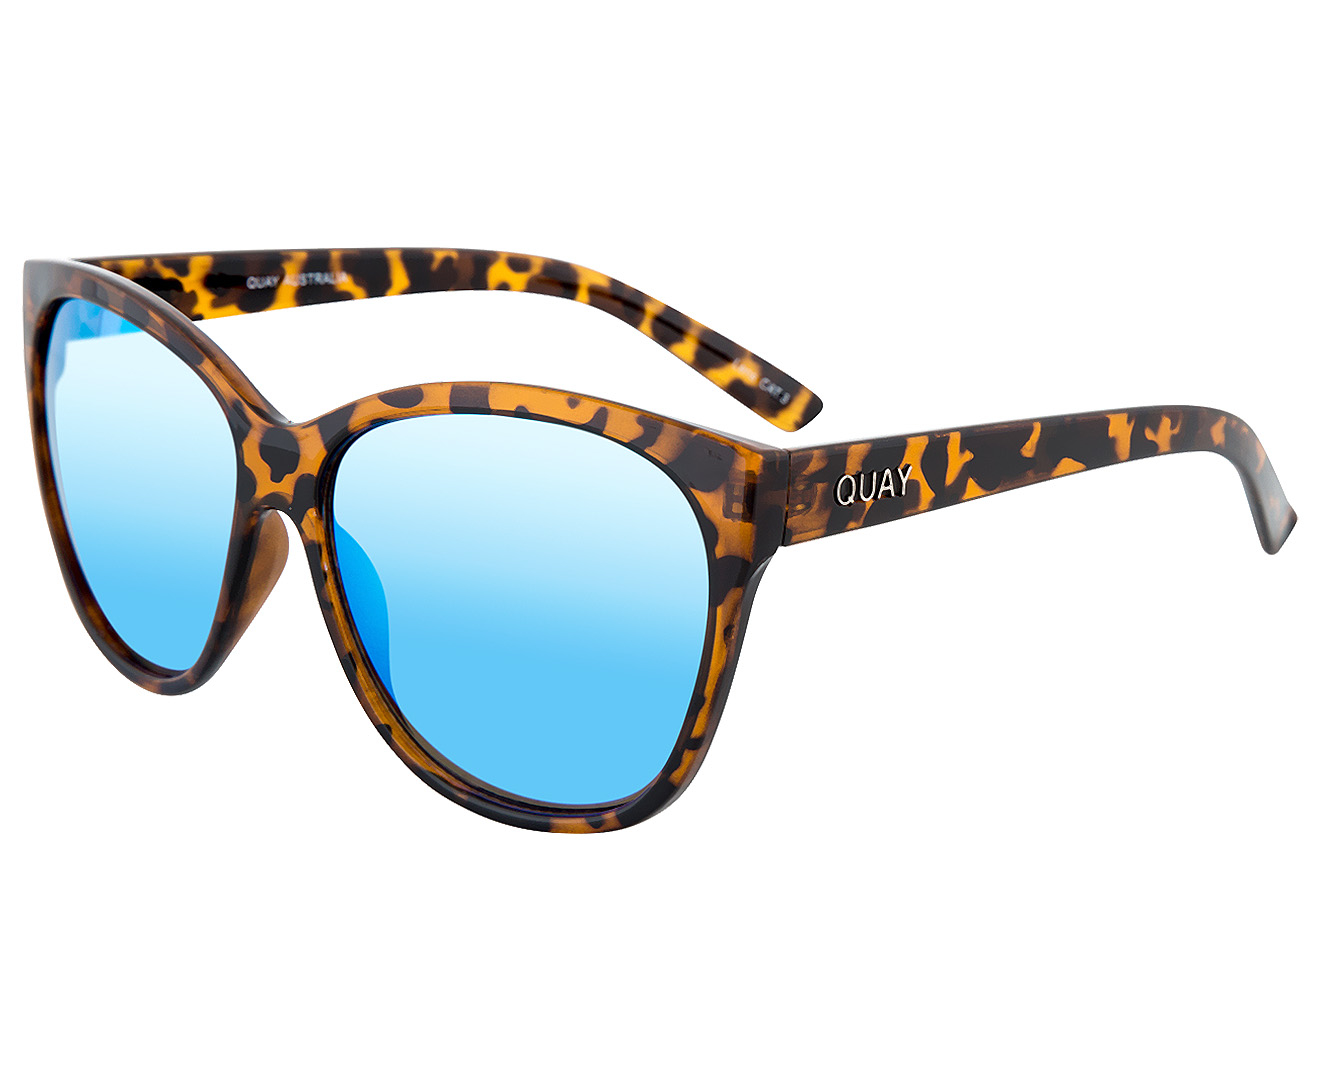 Quay Australia - Buy Quay Australia Sunglasses for Women ...